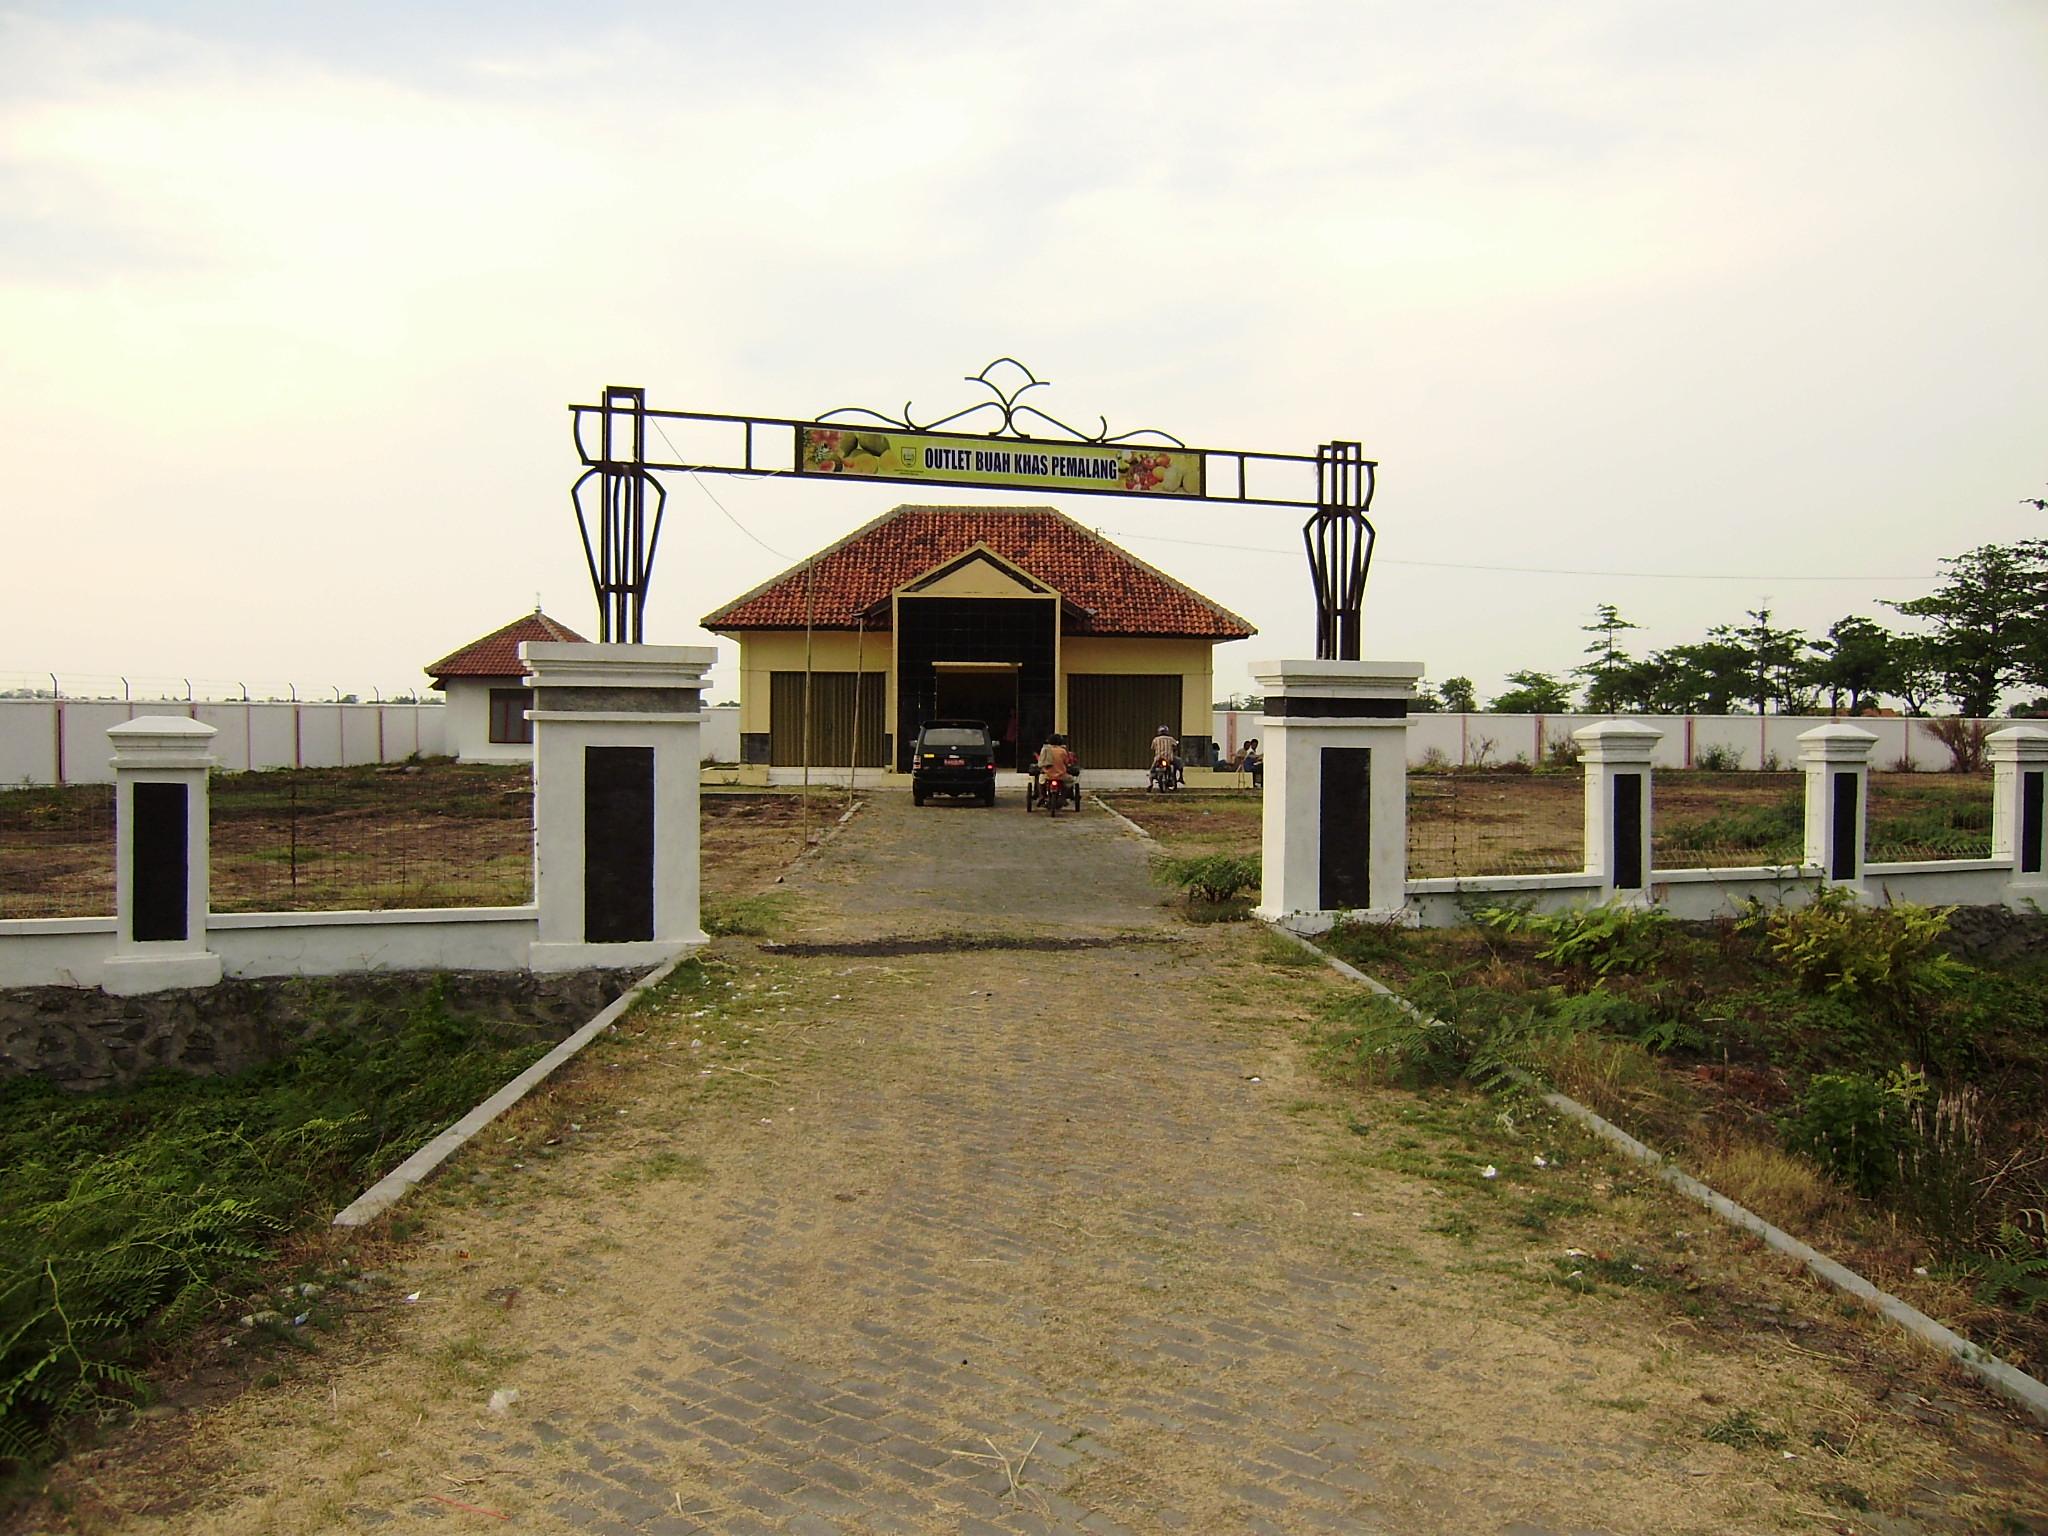 File:Outlet Buah Khas Pemalang - panoramio.jpg